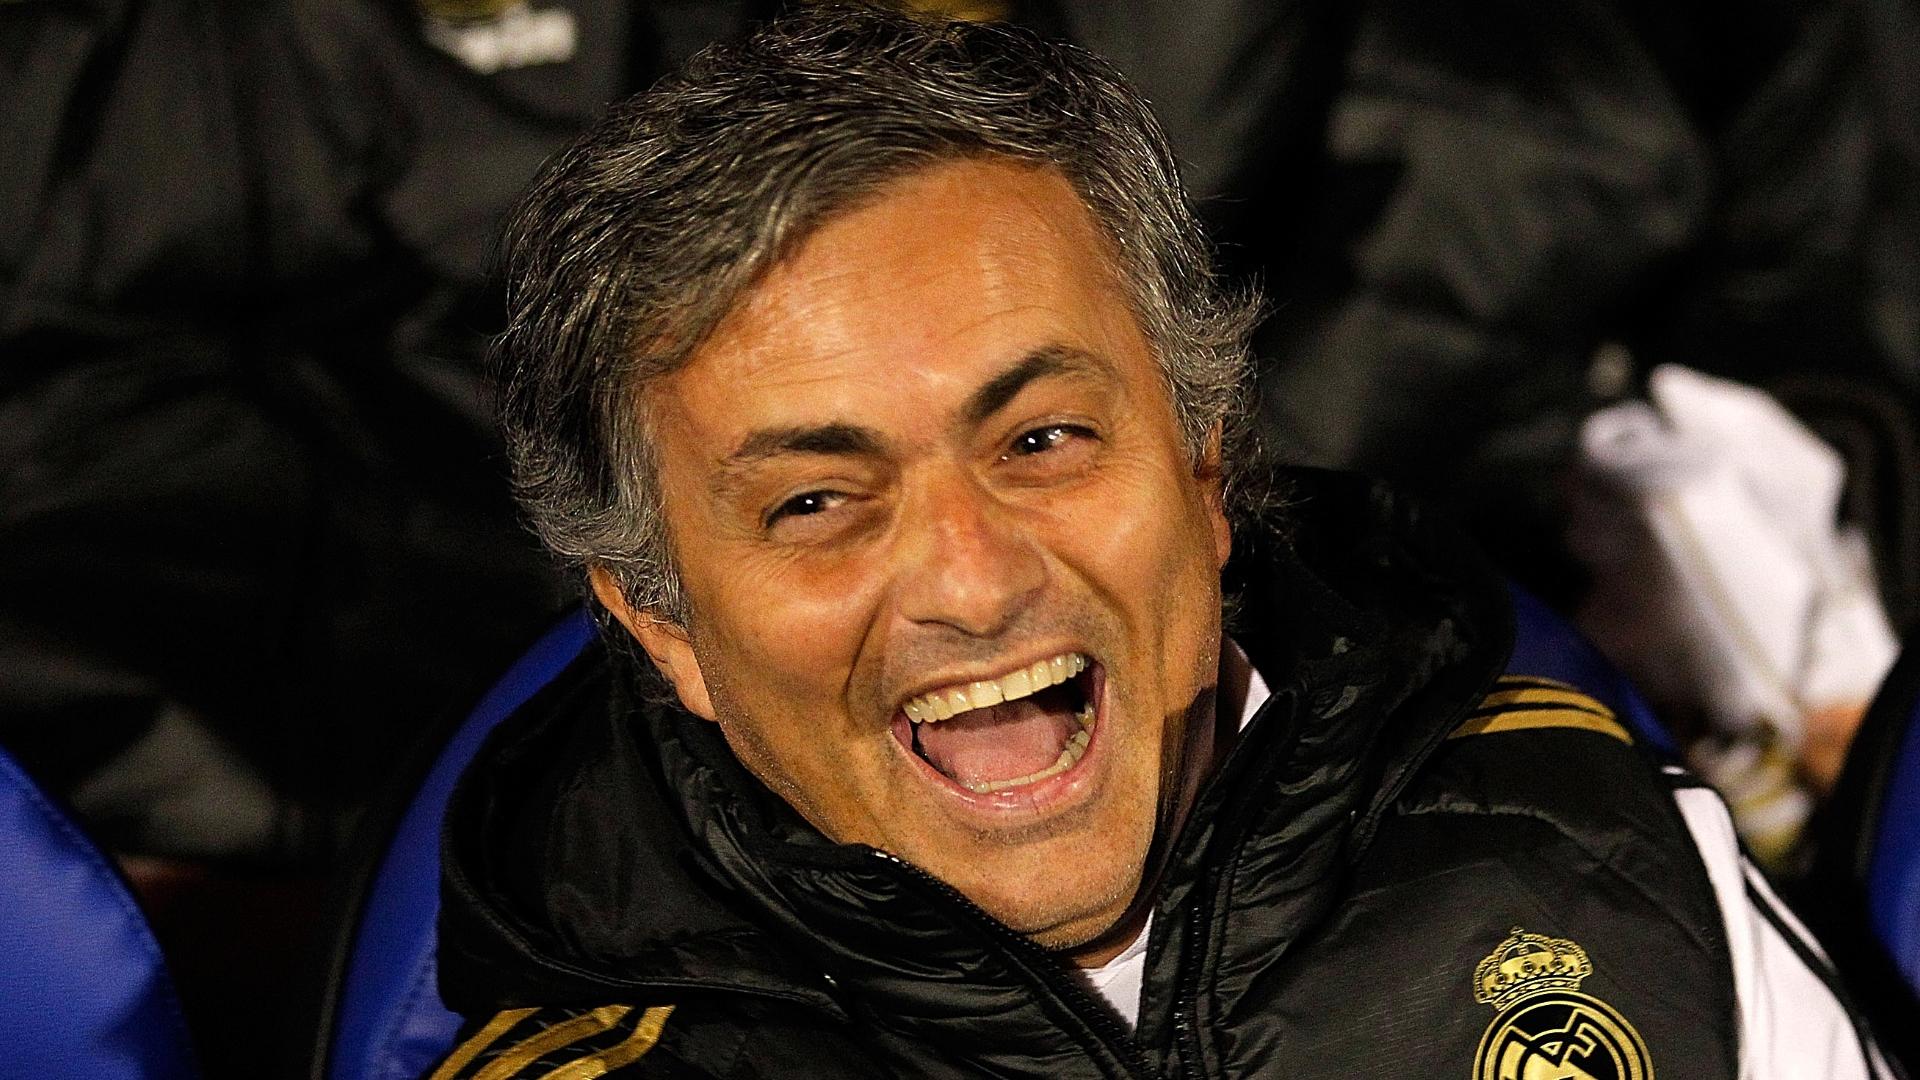 The Official LaLiga Thread - Page 7 Jose-mourinho-real-madrid_r8m4sk4ptr0k17fn4af7ux4eb